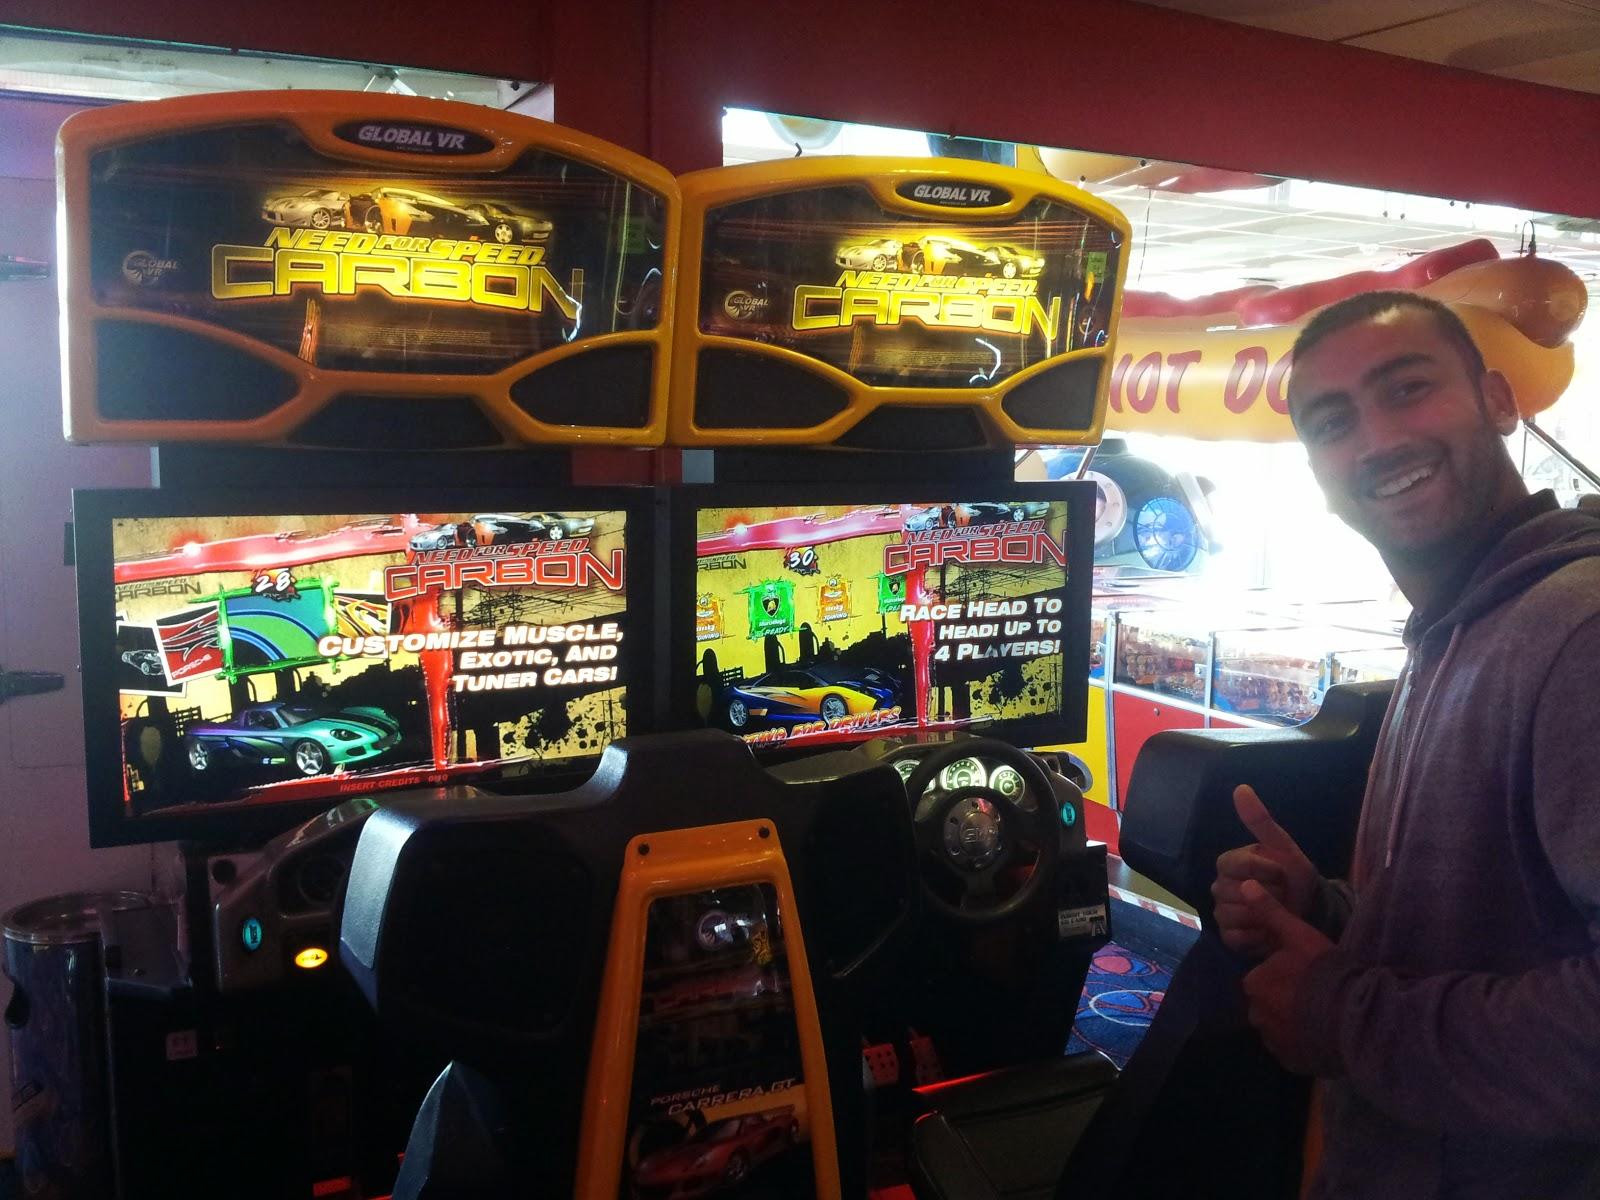 Arcade, Games freezer